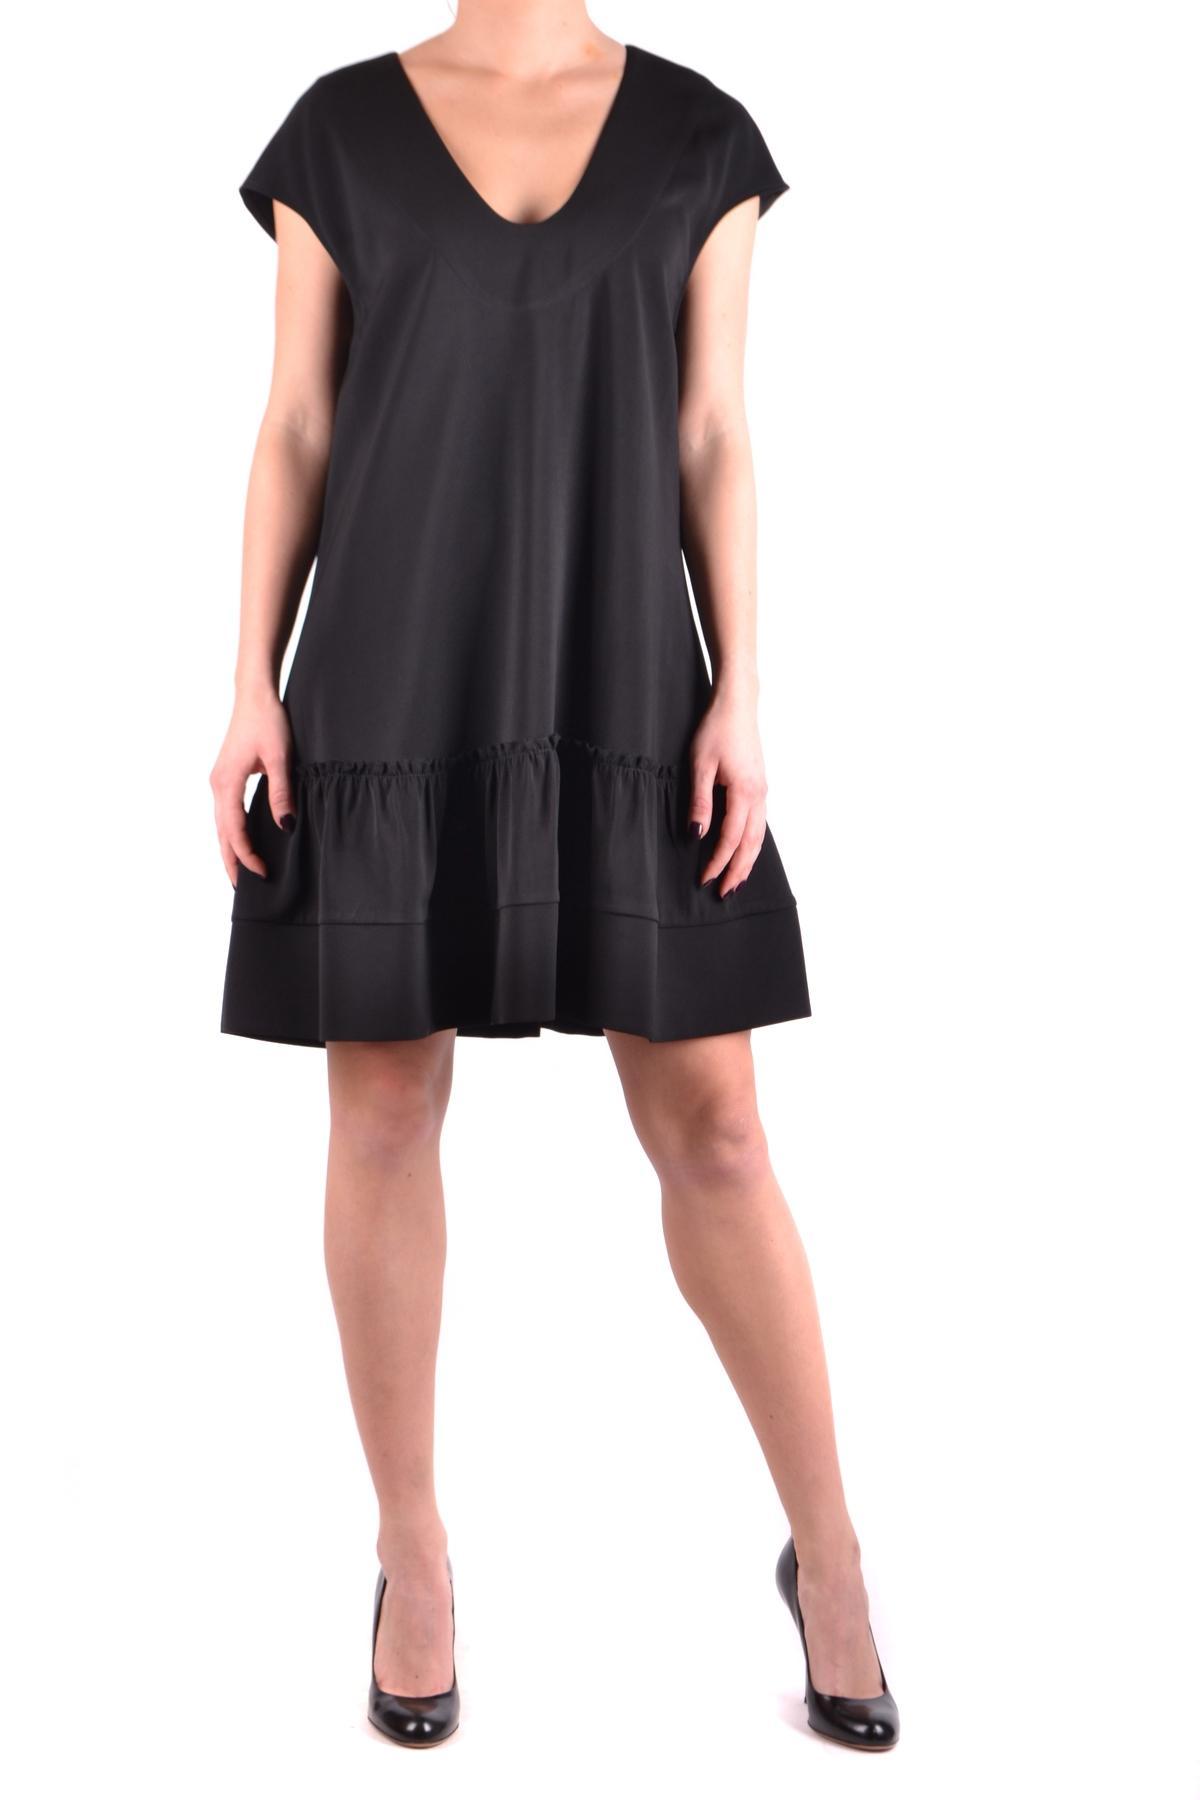 half off 84f47 eb953 Twin Set Twin-set Simona Barbieri Dress in Black - Lyst